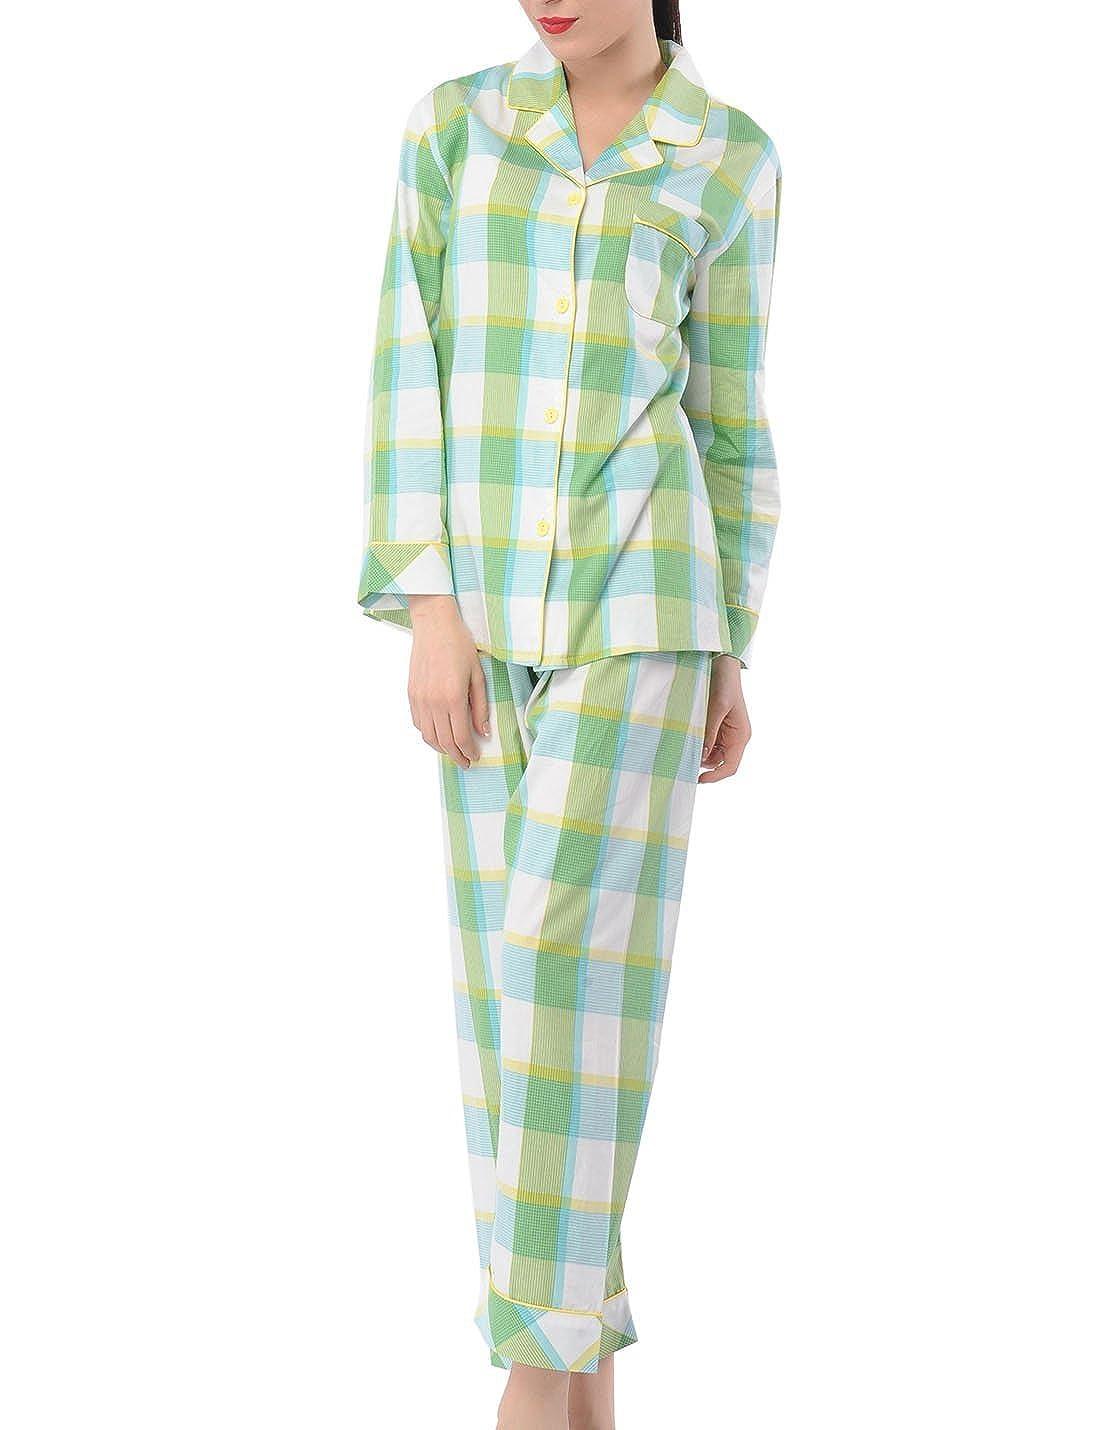 6709cd66a3c3 LIQQY Women s Pajamas Comfy Cotton Long Sleeve Sleepwear Two Pieces PJ Set  XS-XXL at Amazon Women s Clothing store